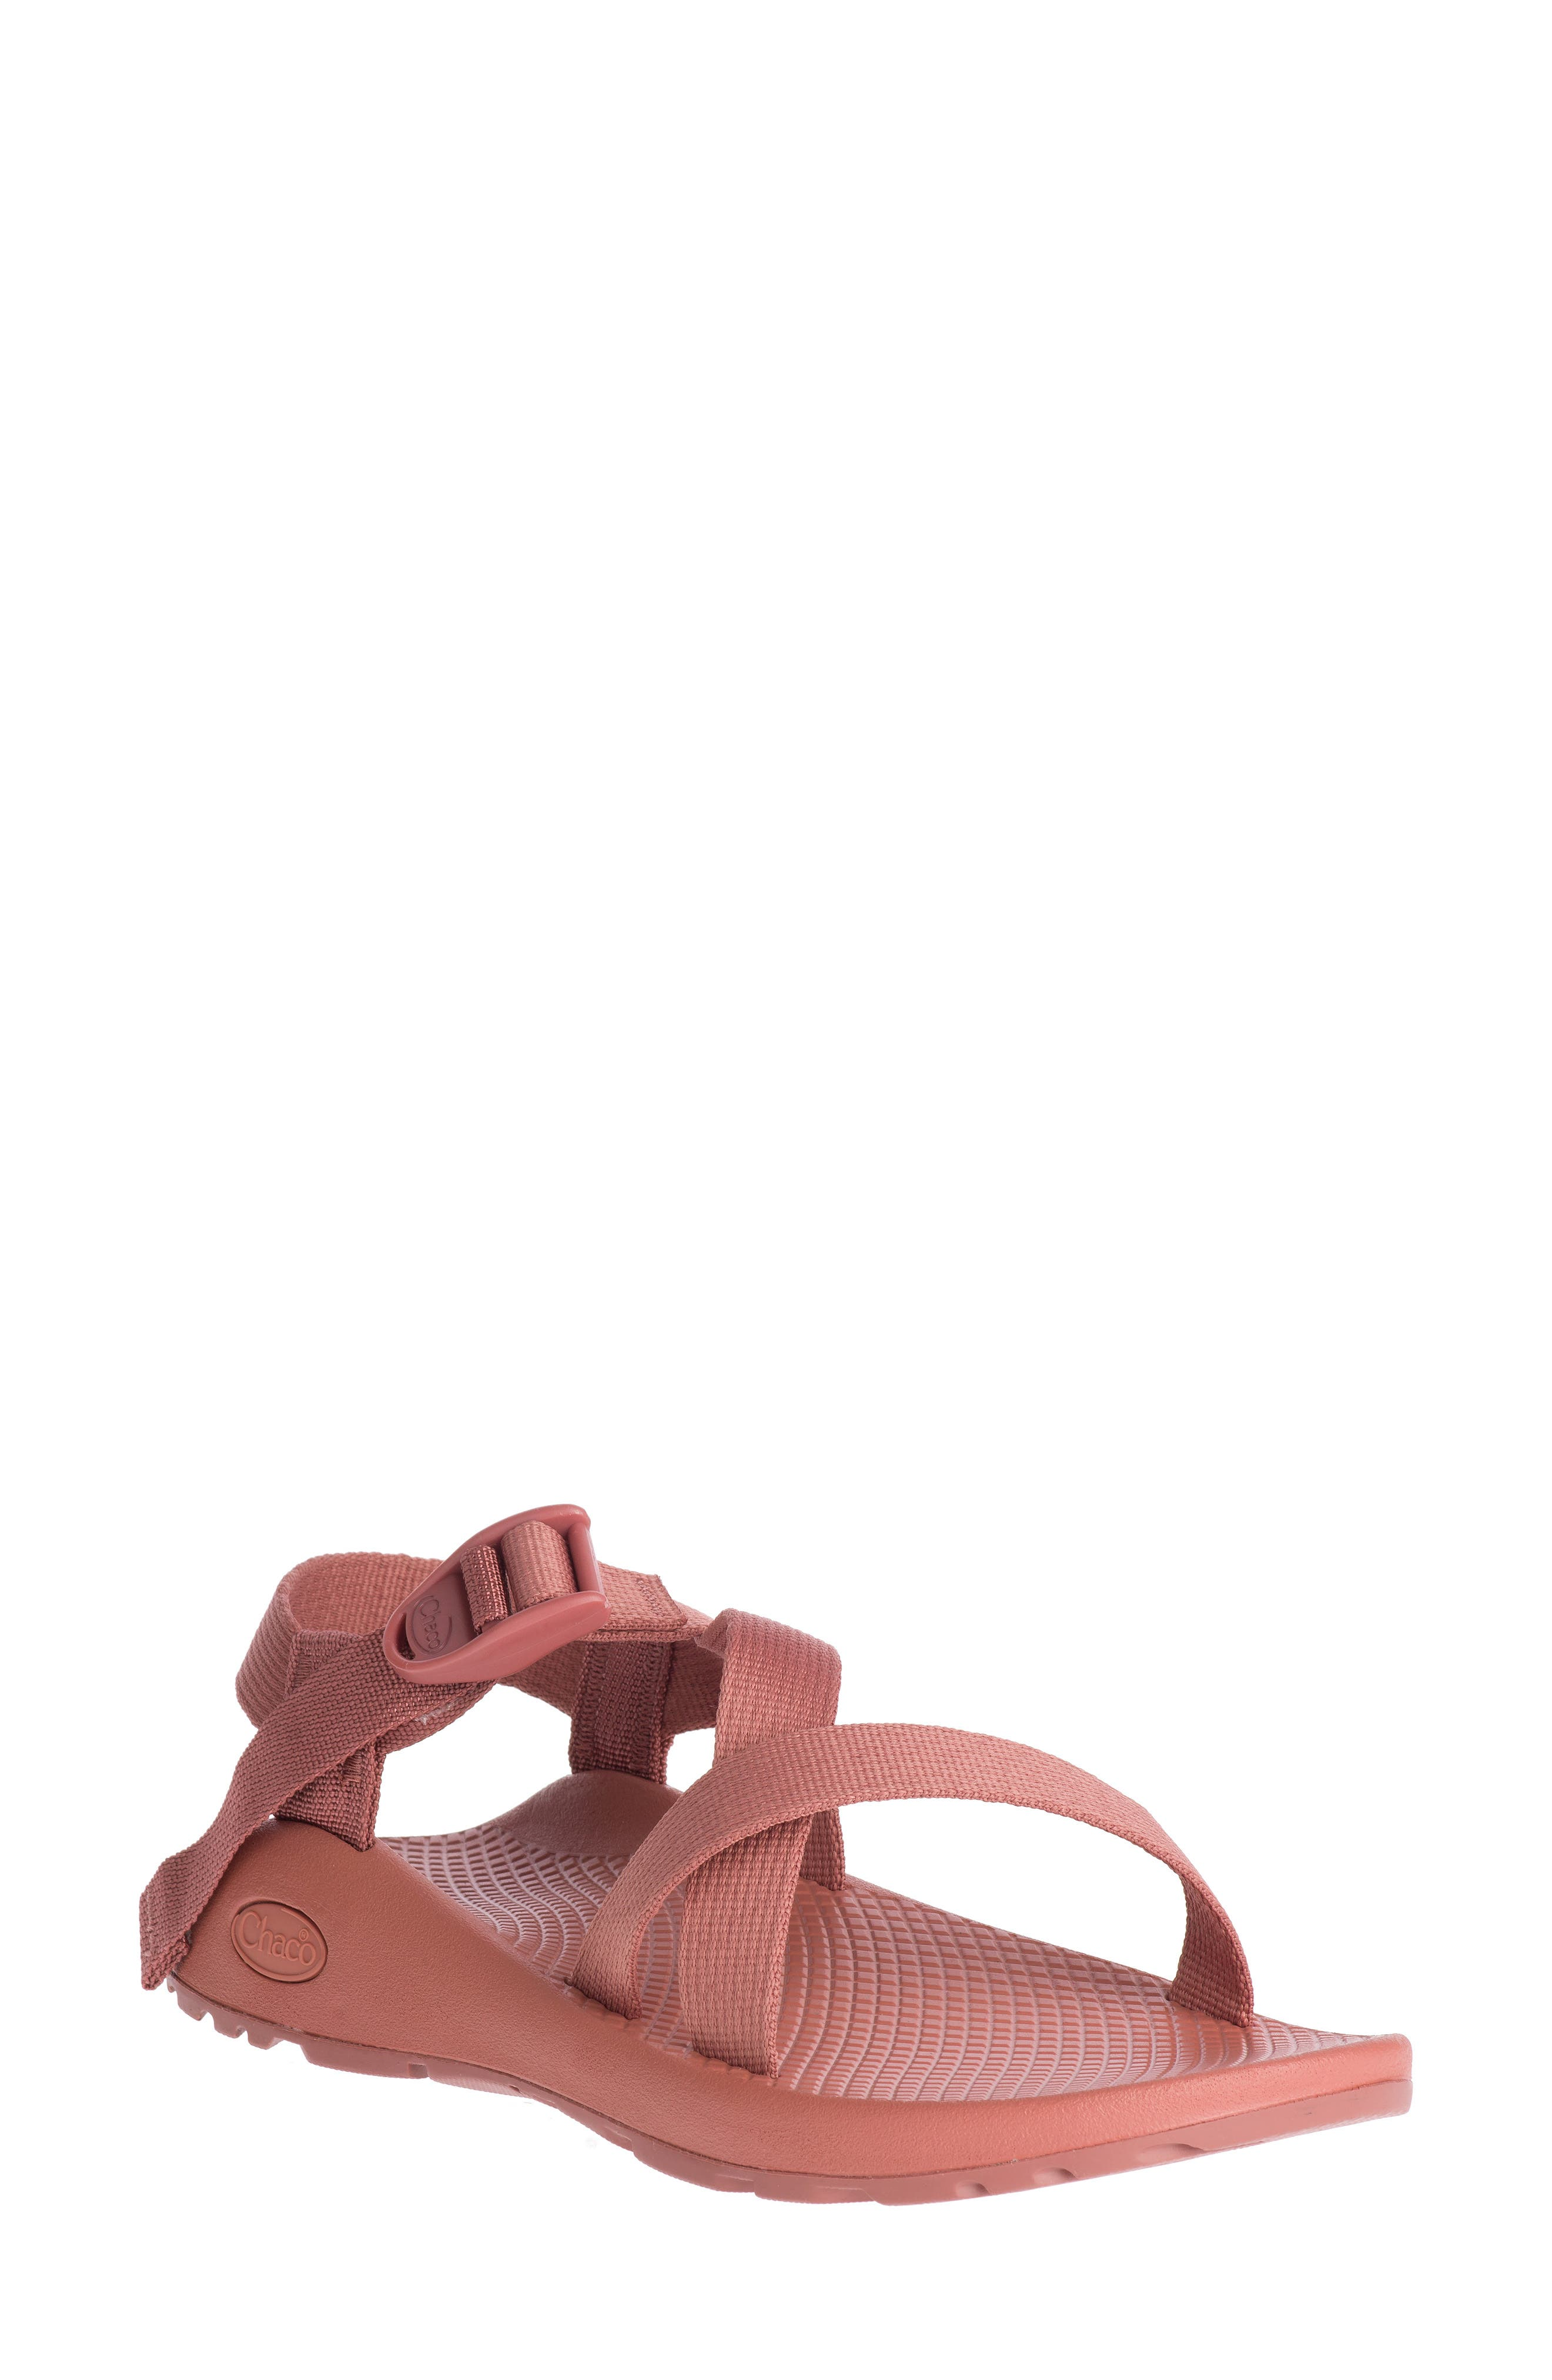 Z1 Classic Monochrome Sandal